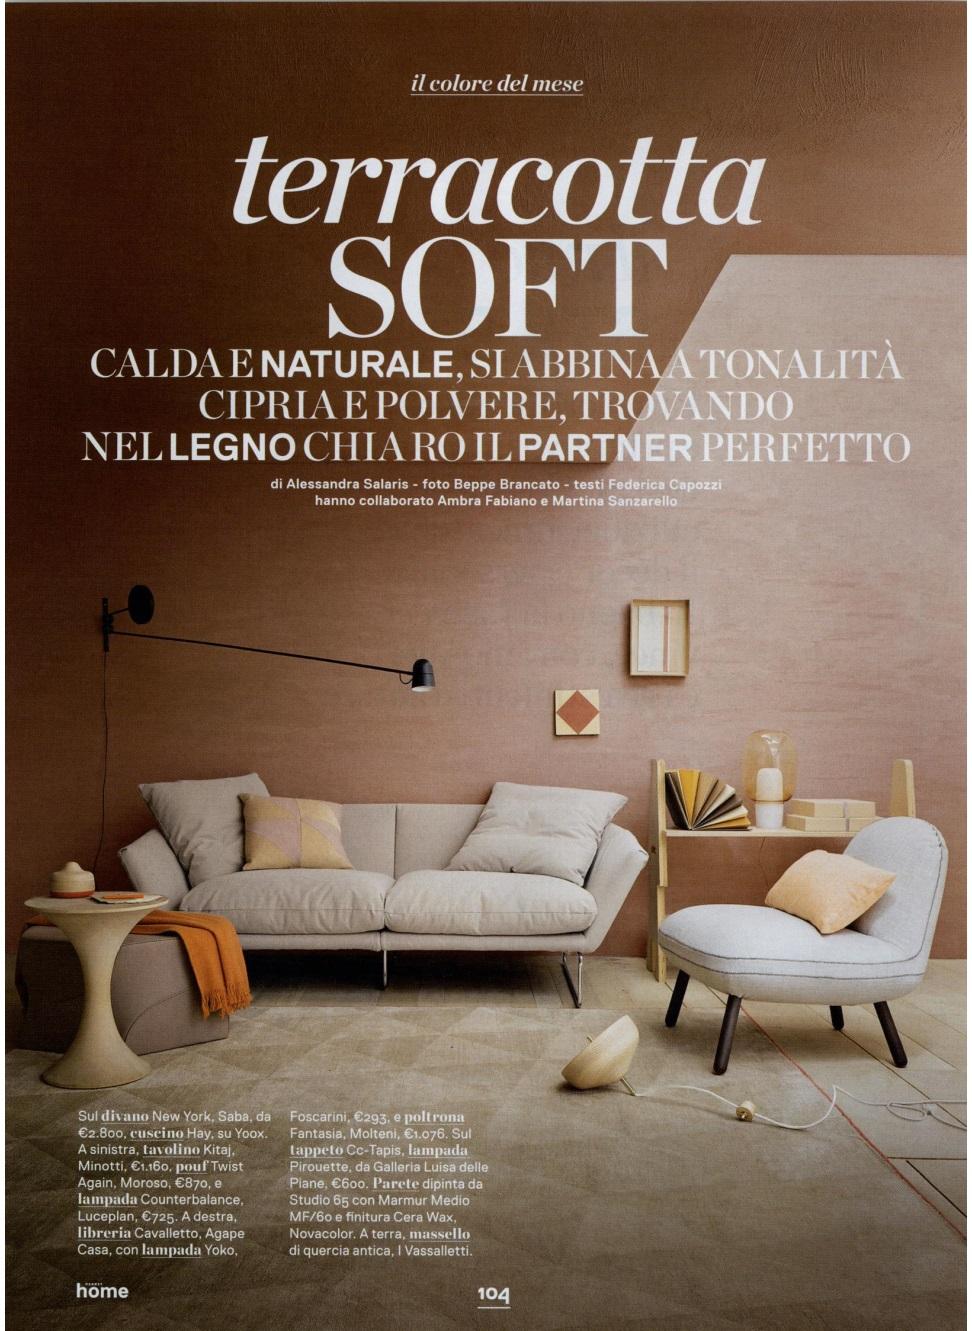 Lampada Da Studio Design moroso - hearst home-01/04/2014-79848154 | moroso